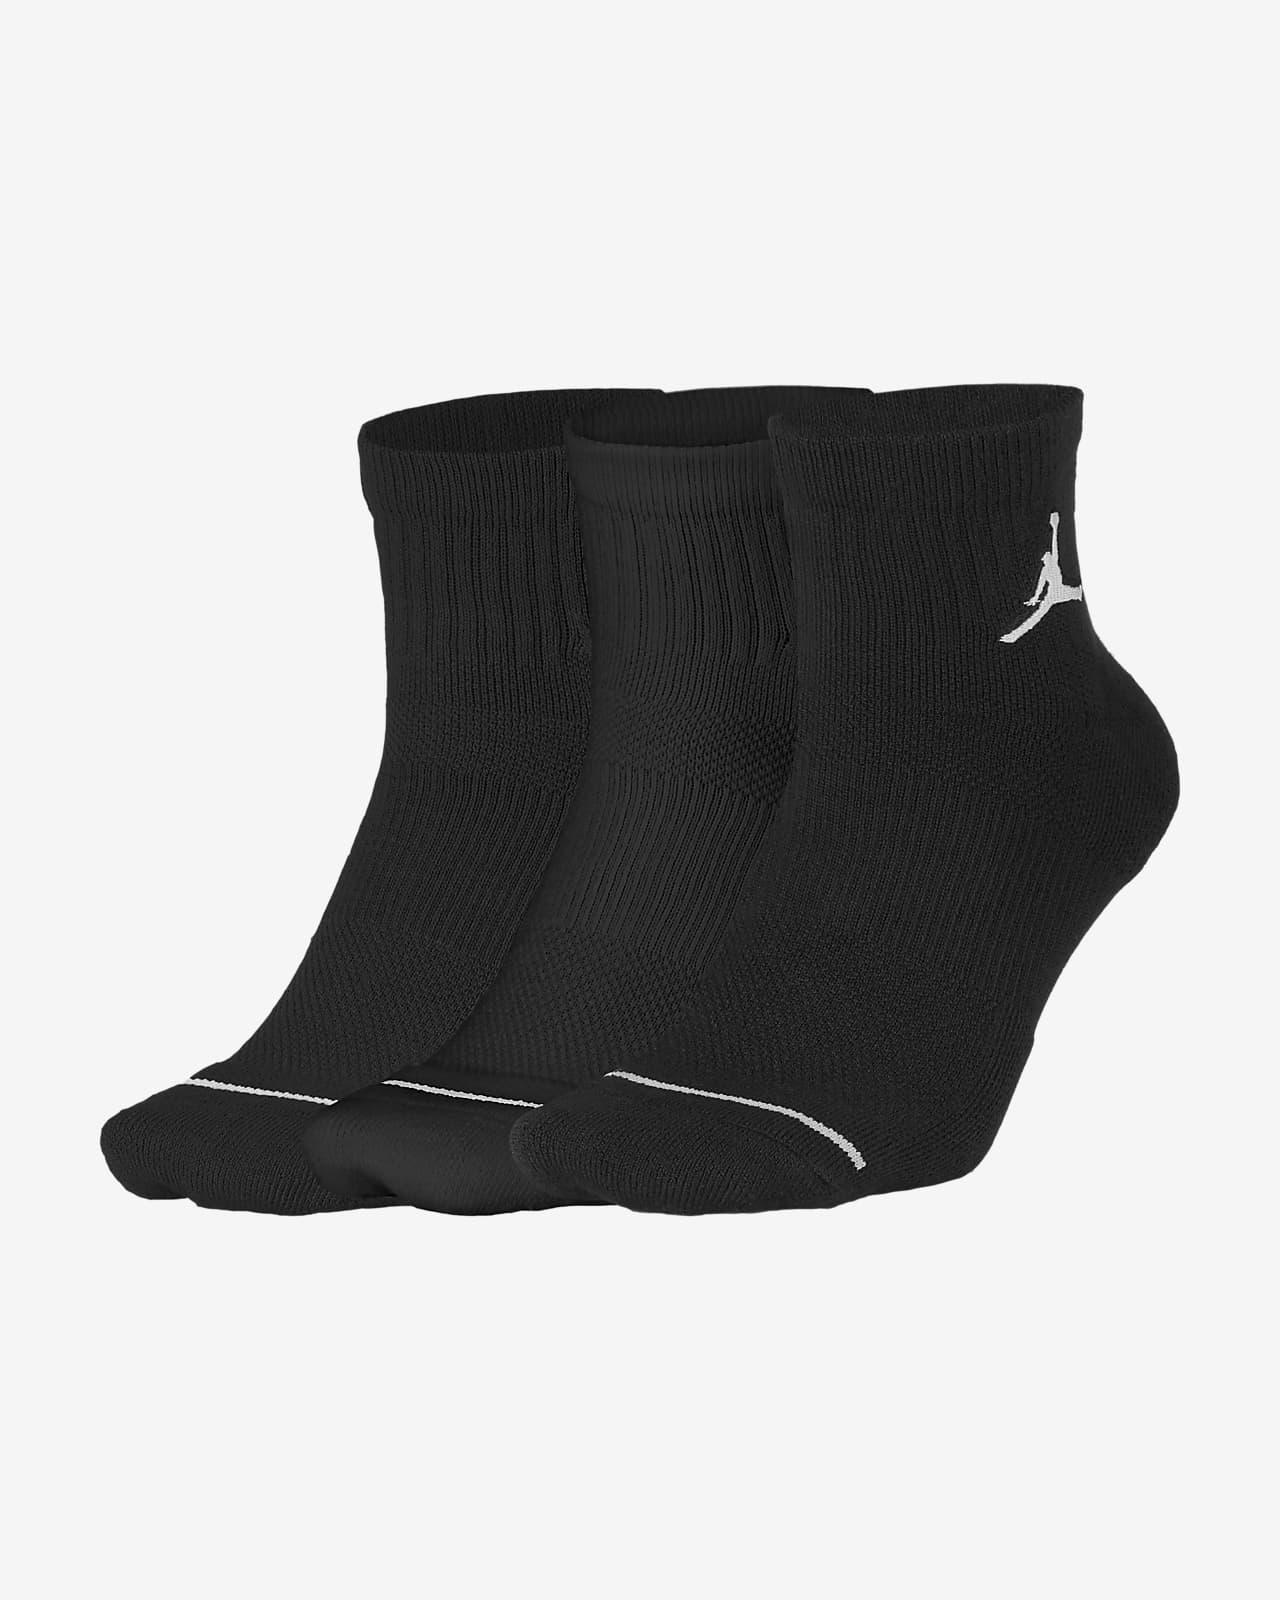 Jordan Everyday Max Ankles Socks (3 Pair)